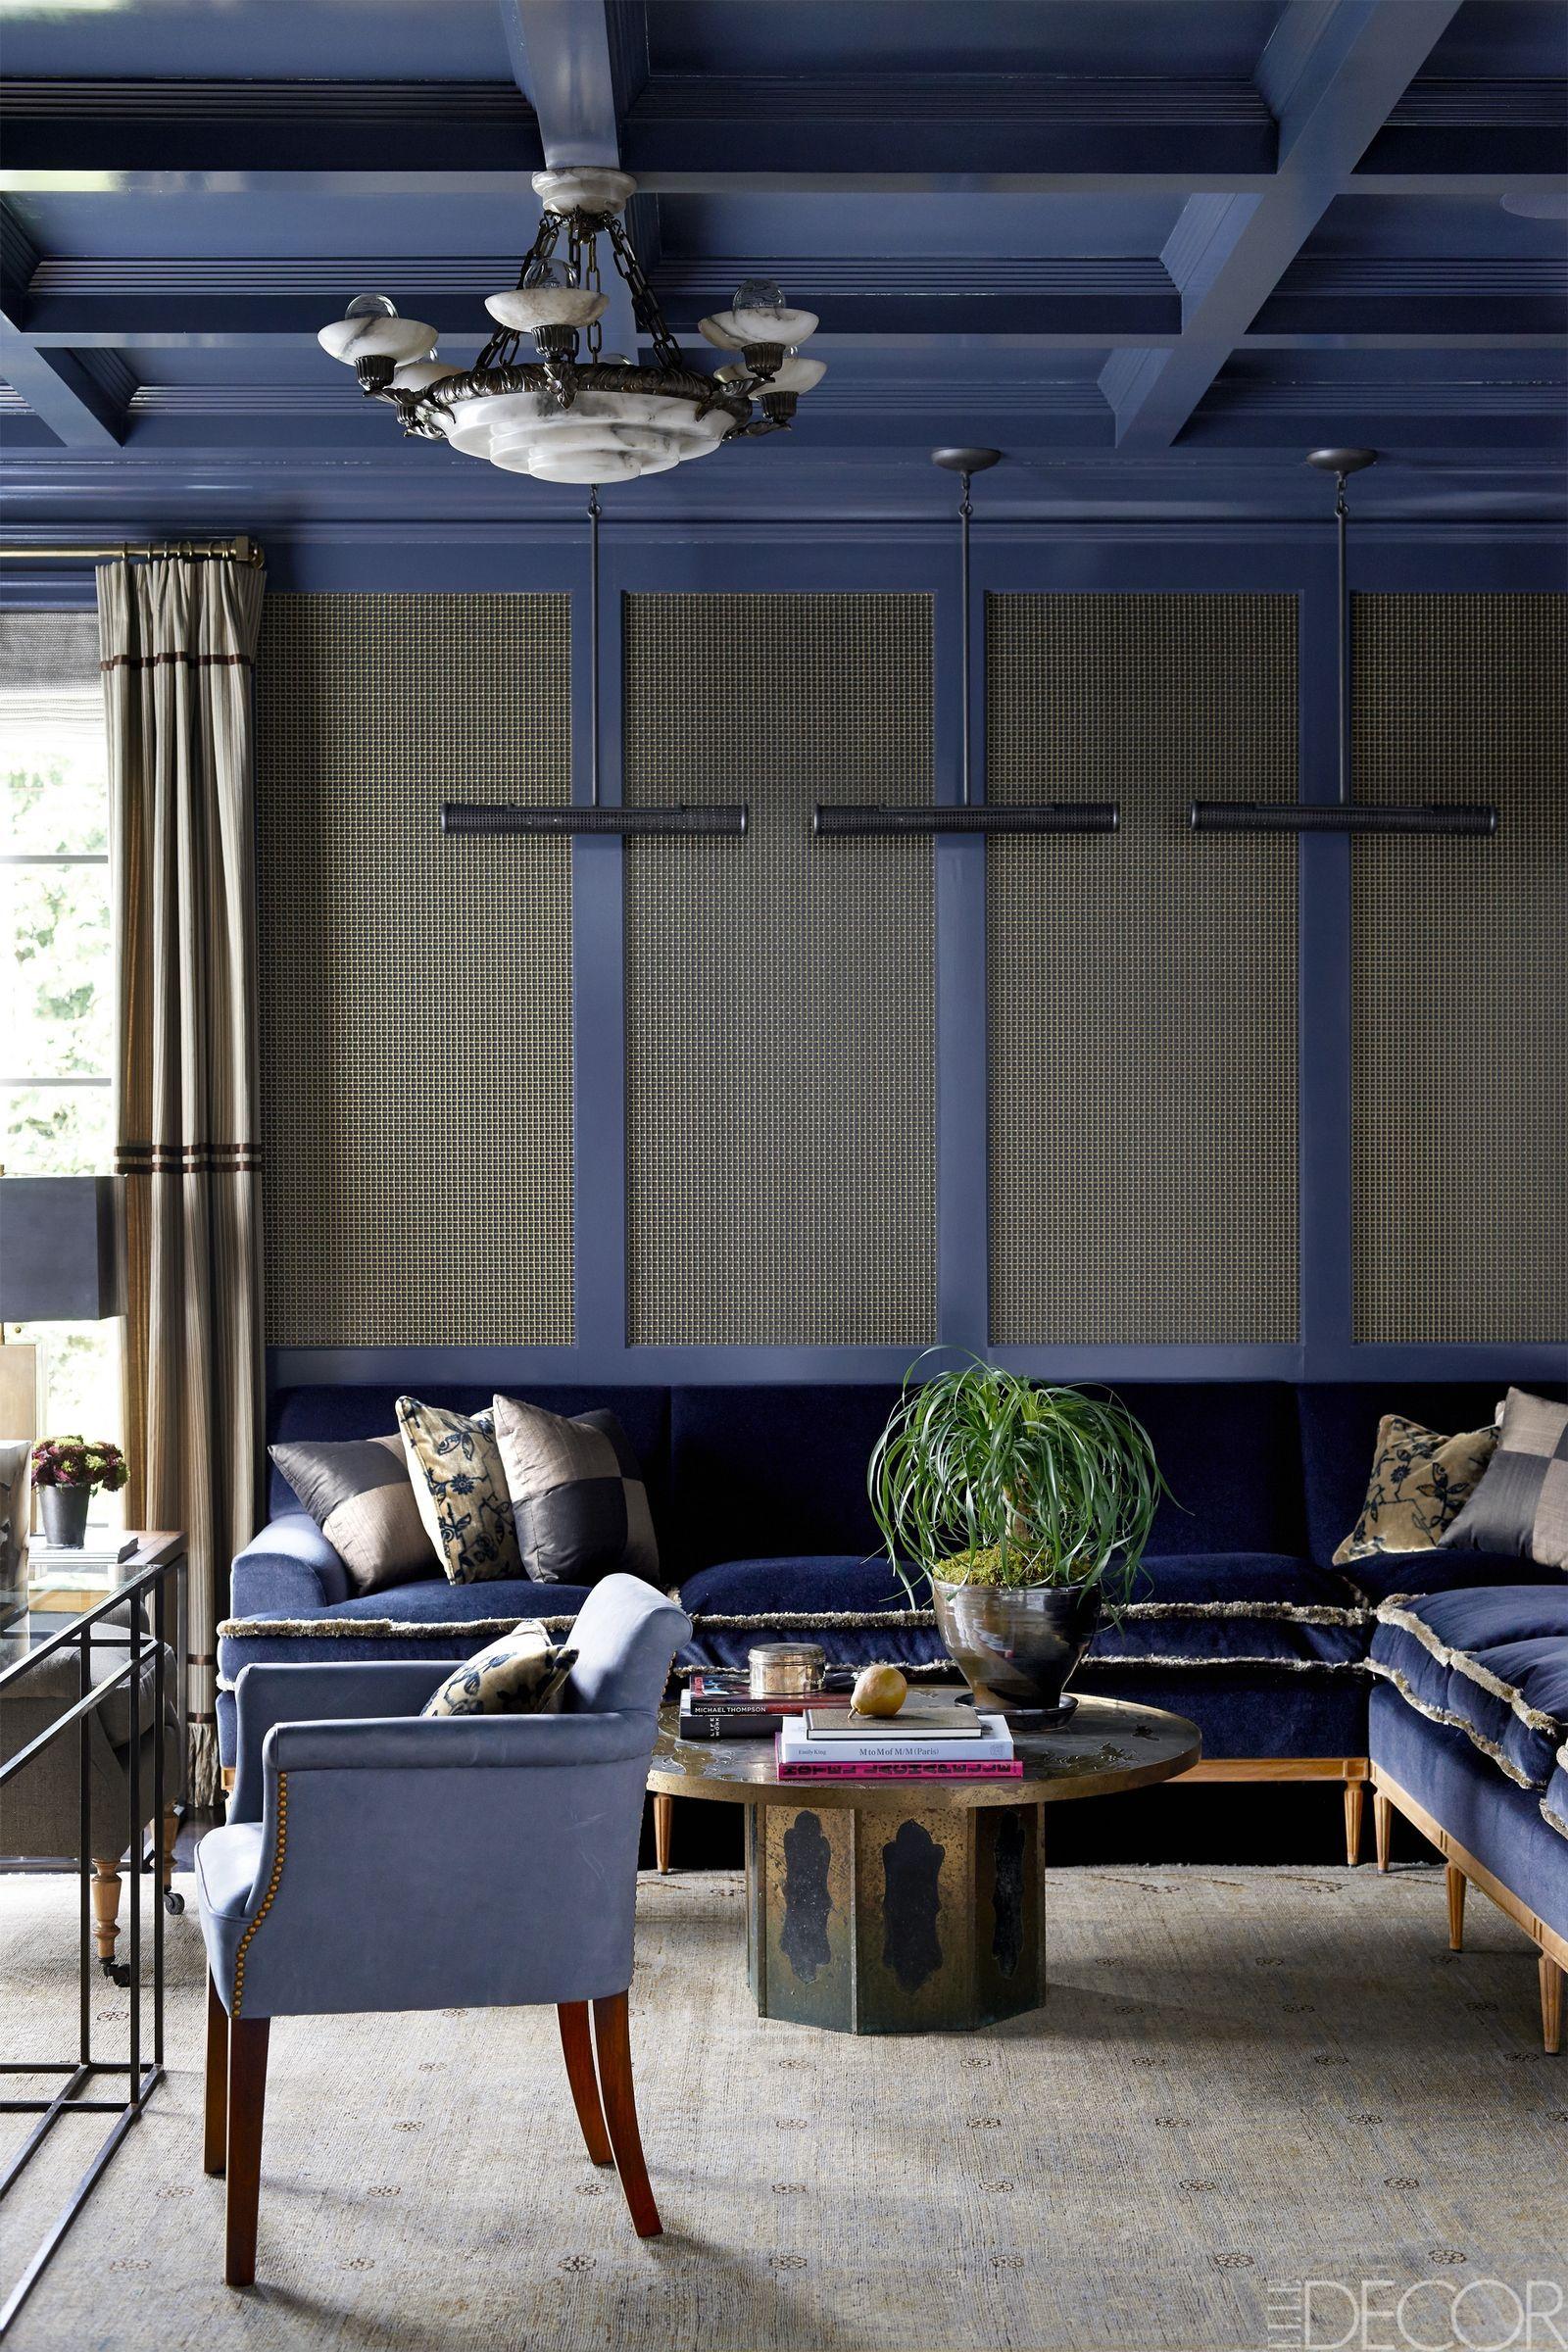 HOUSE TOUR A Minimalist Mansion Designed For